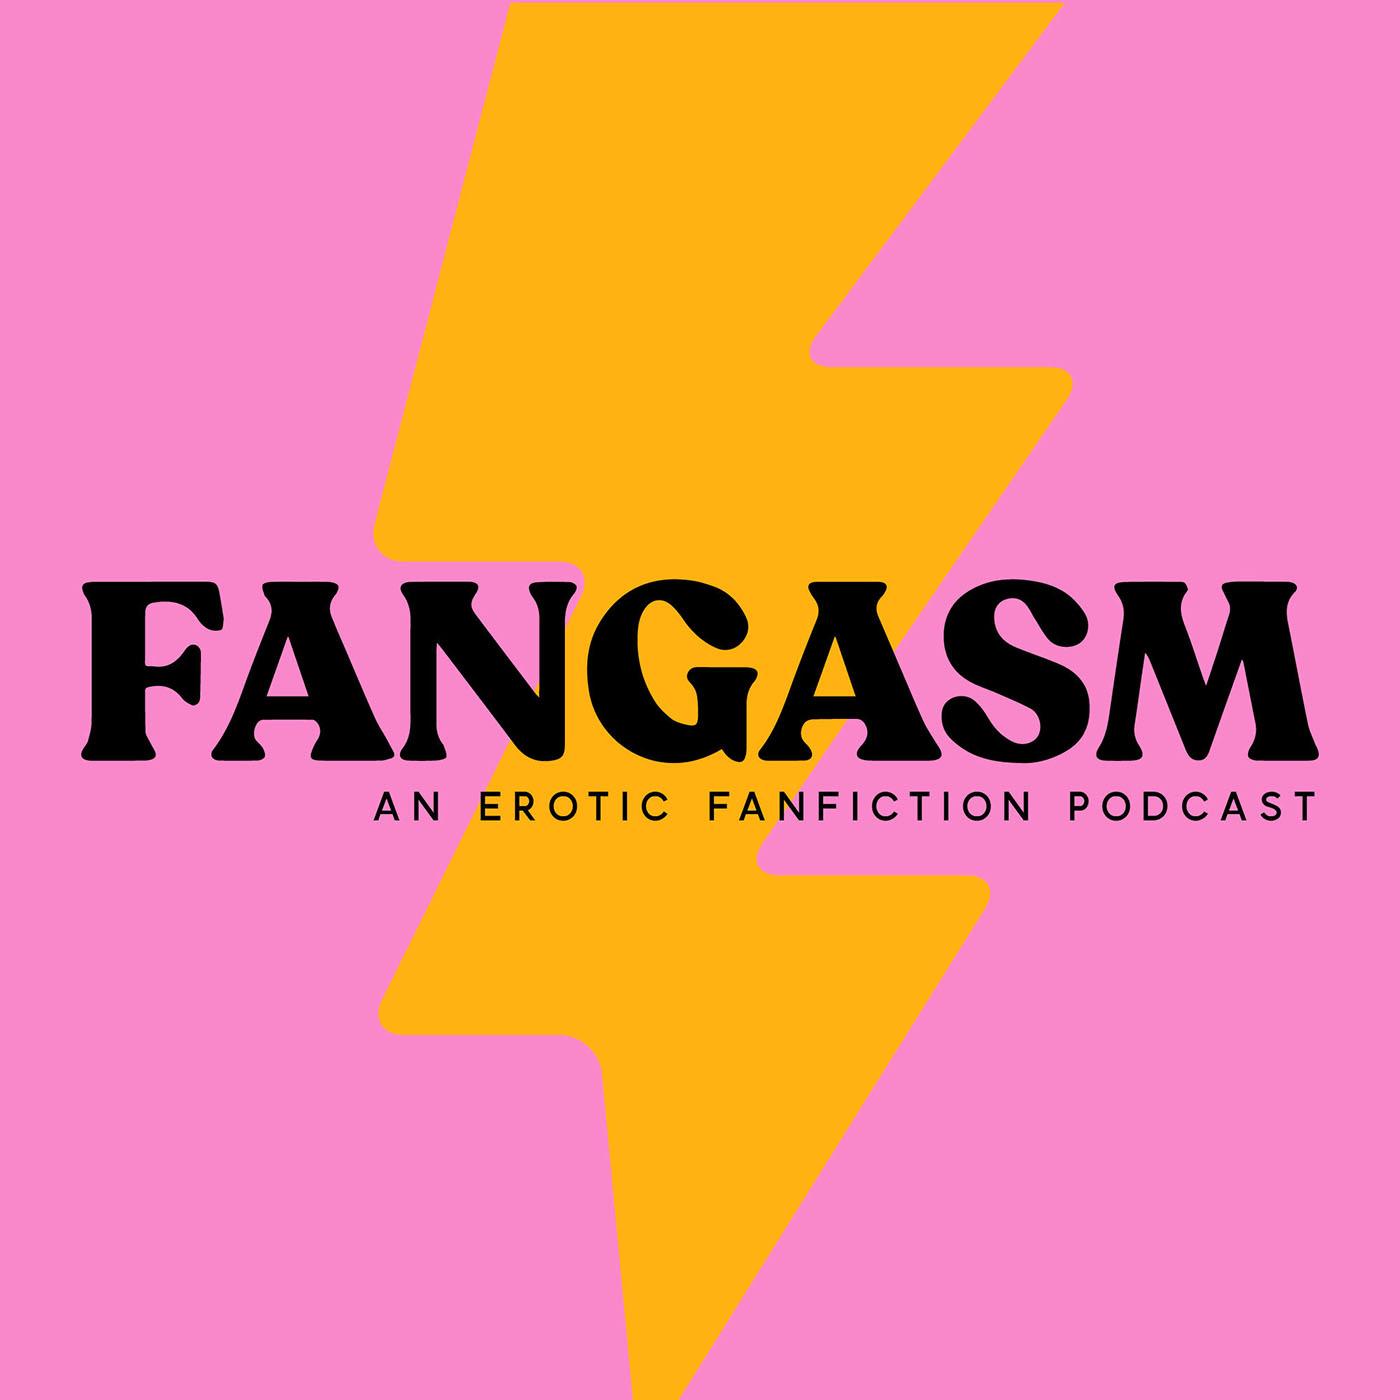 Best Episodes of Fangasm